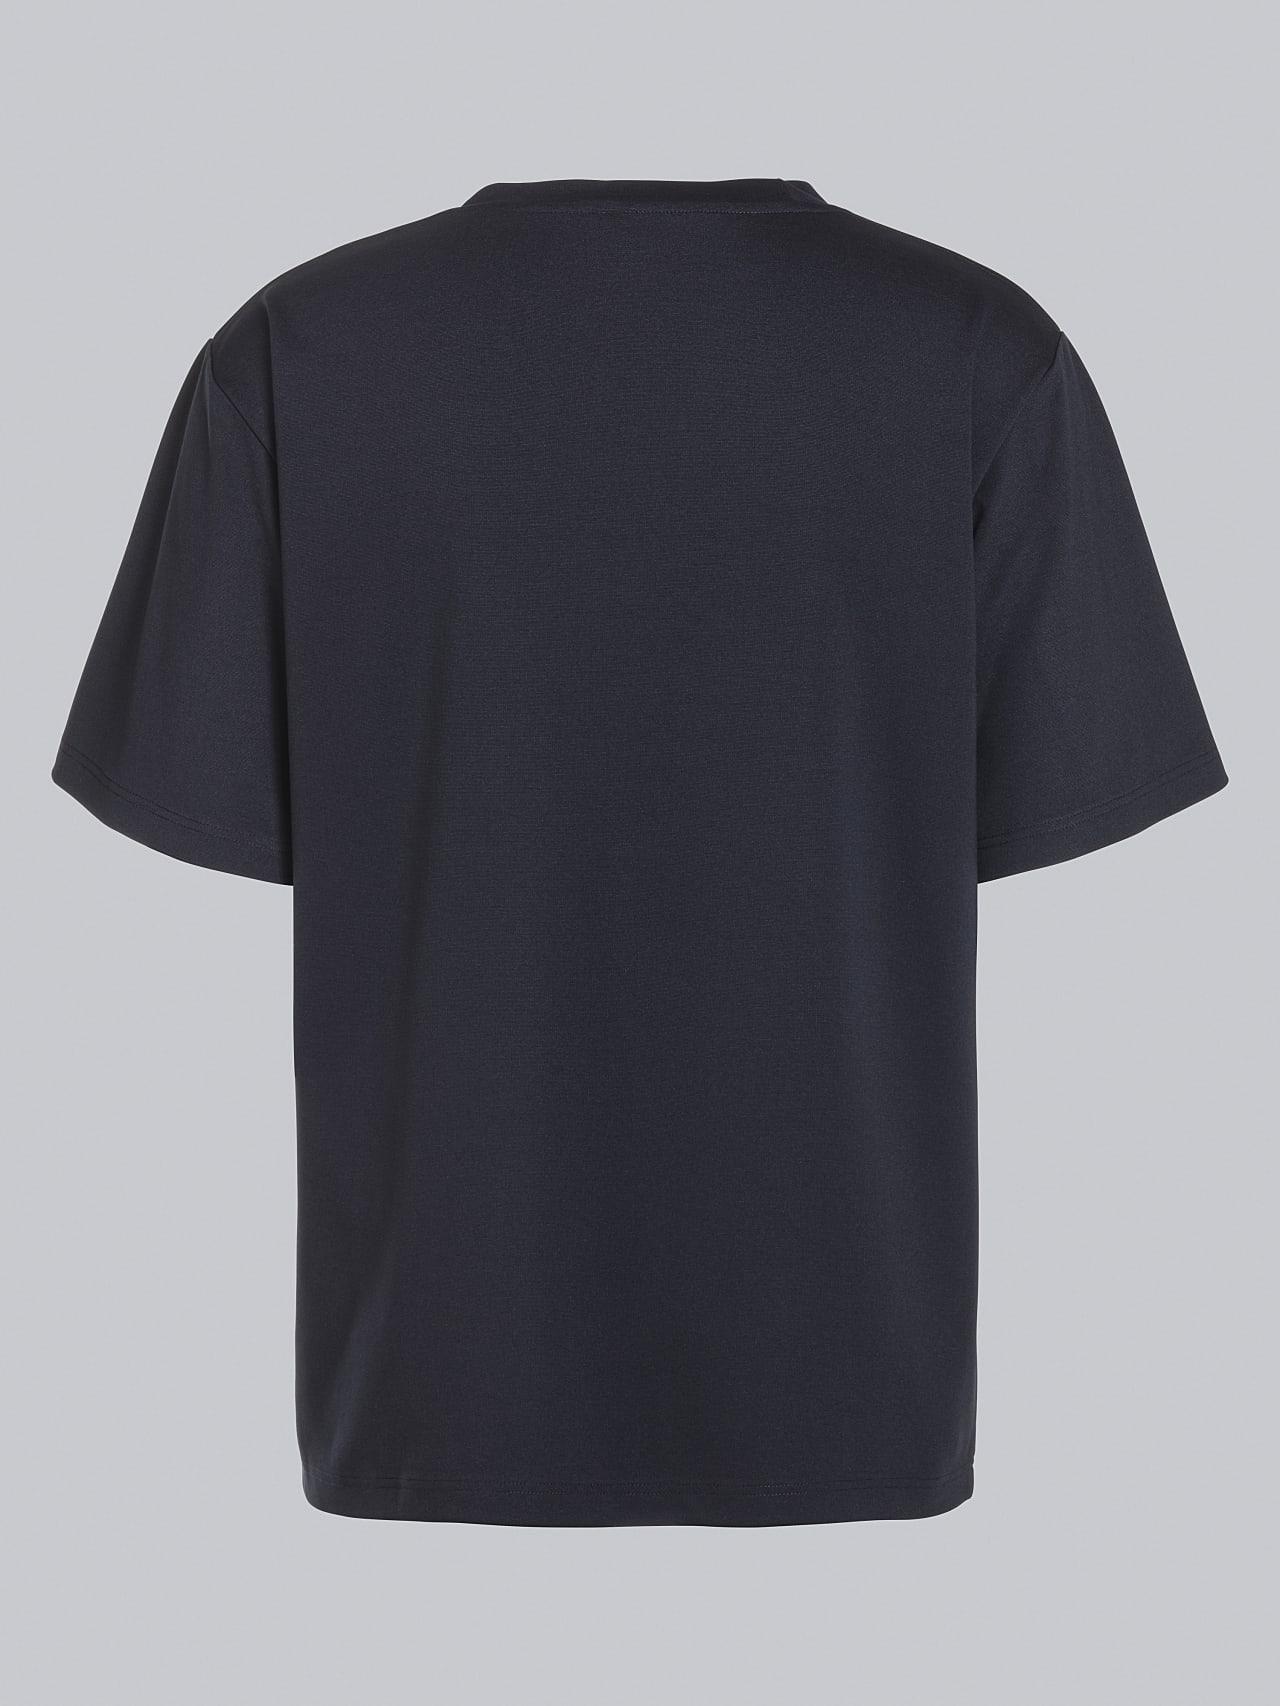 JAHEV V1.Y5.02 Relaxed Logo T-Shirt navy Left Alpha Tauri